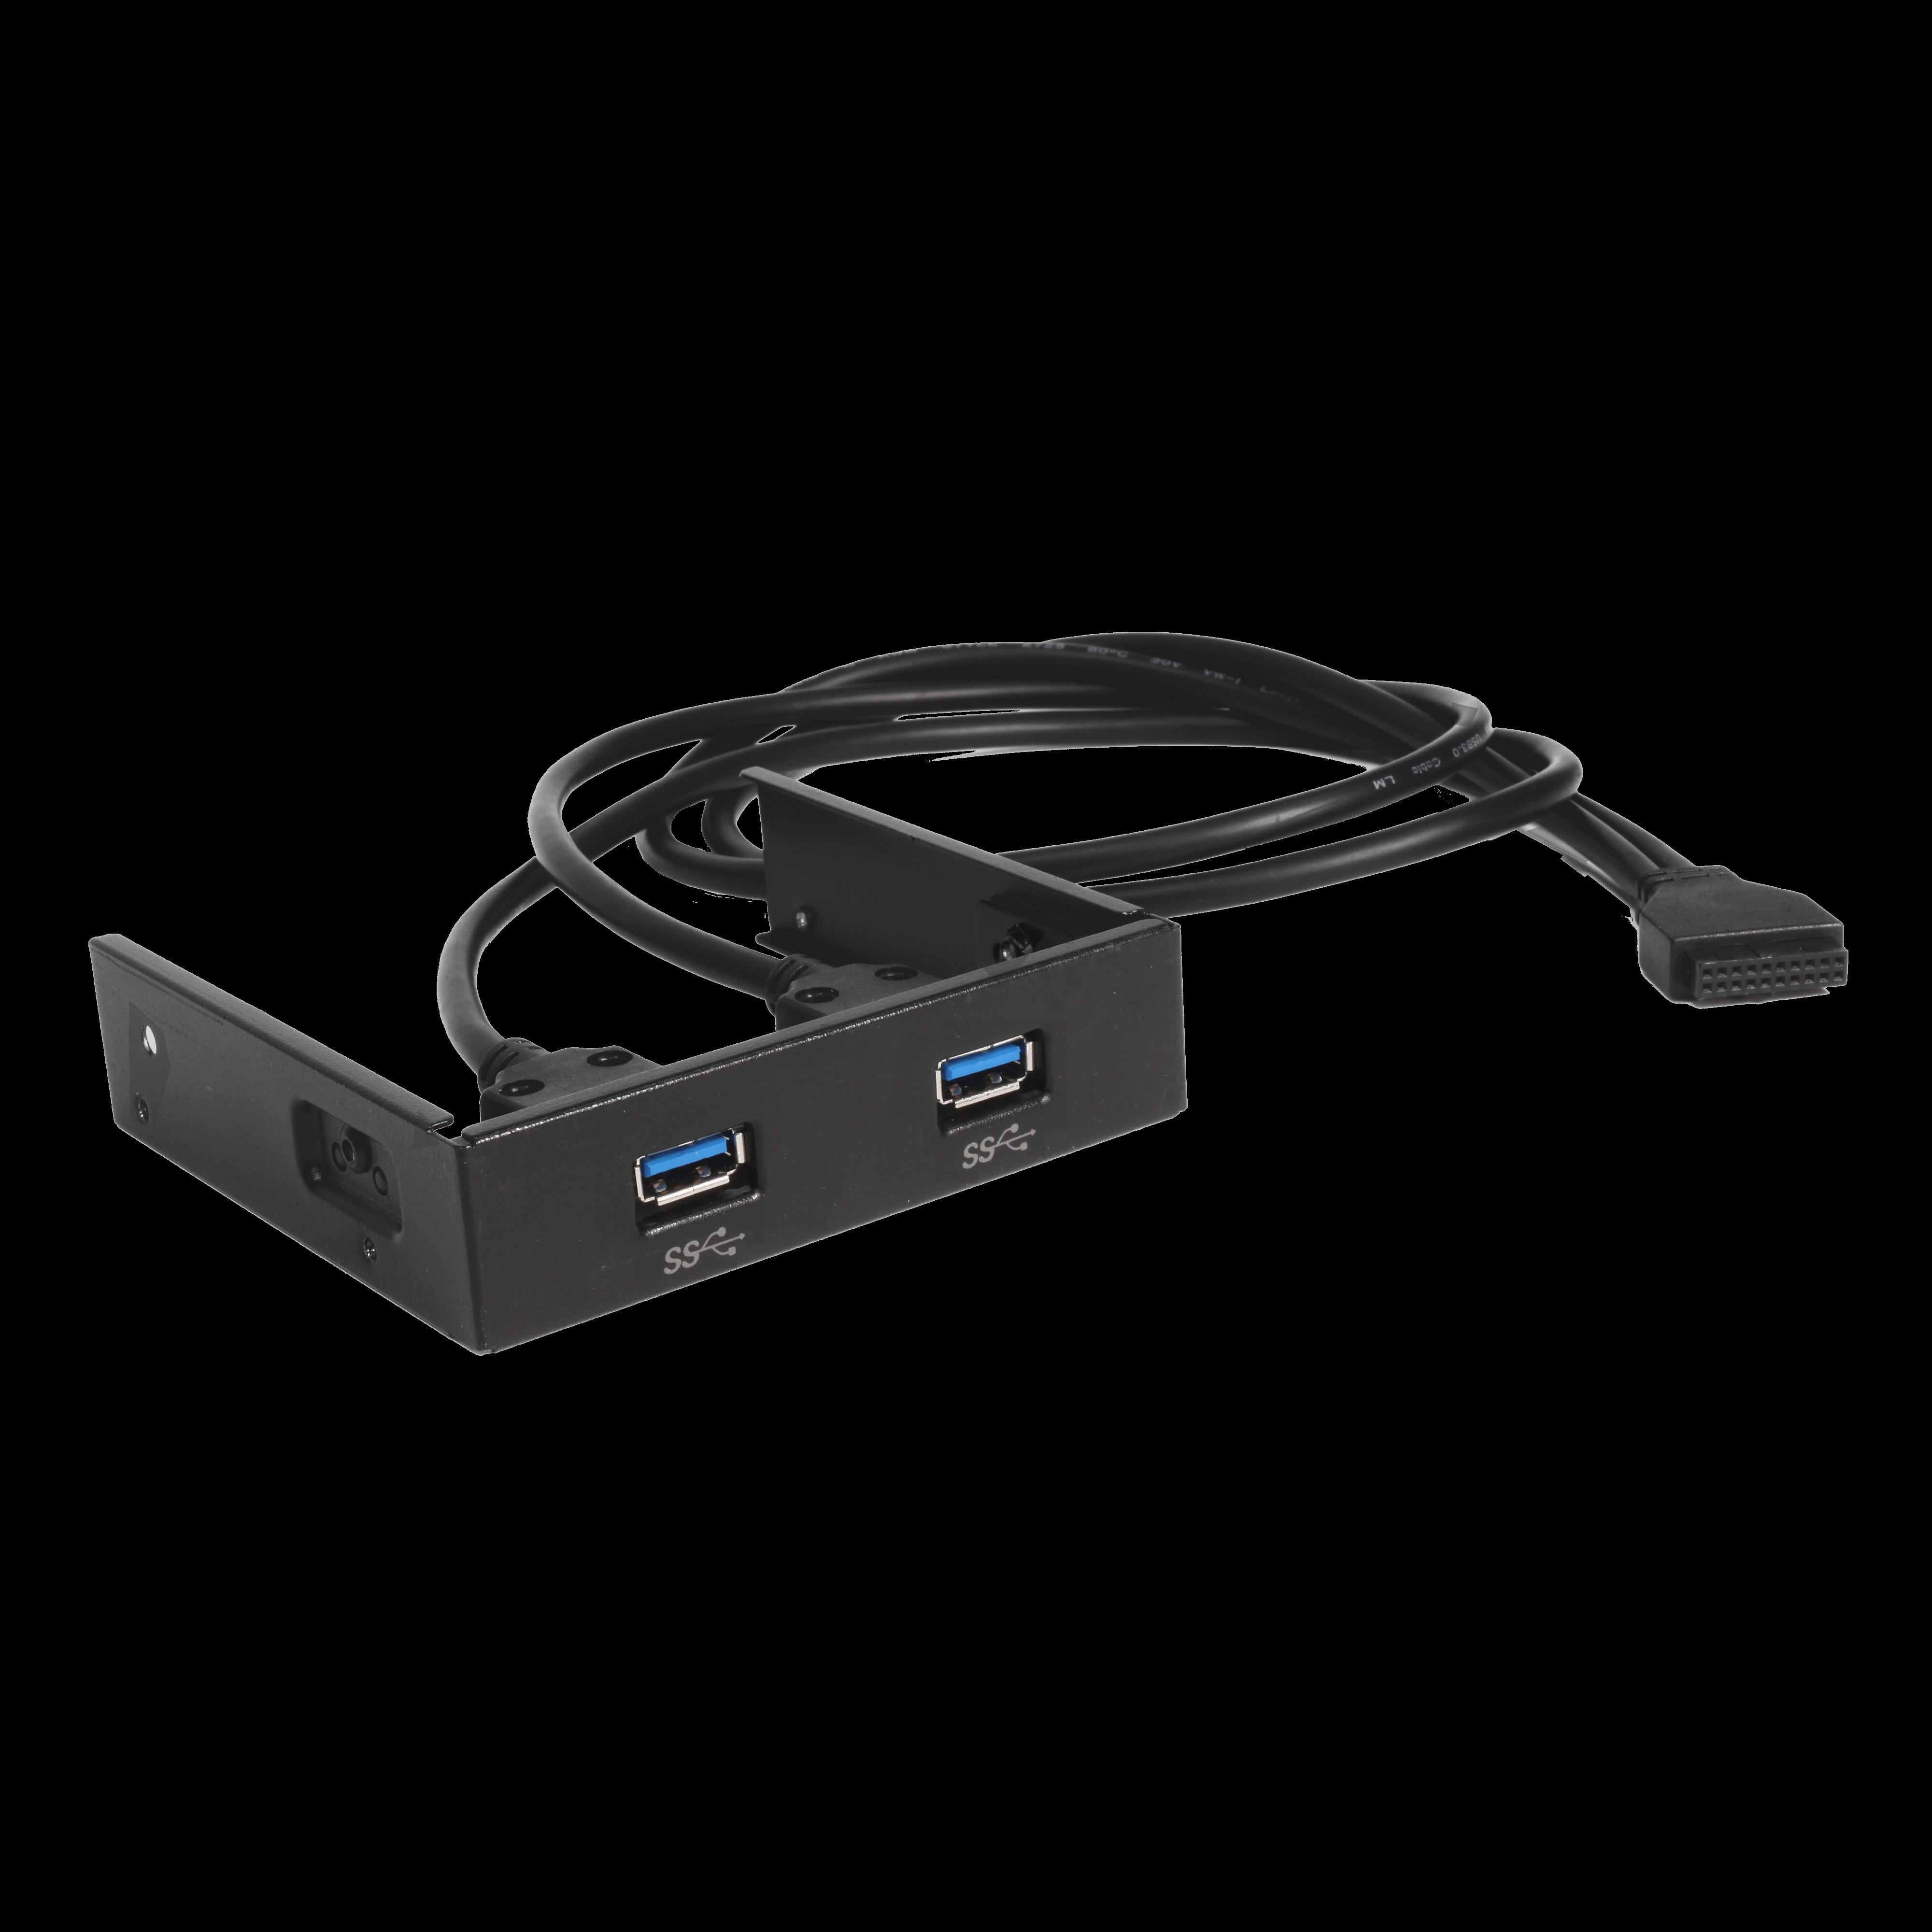 USB 3.0 bracket.